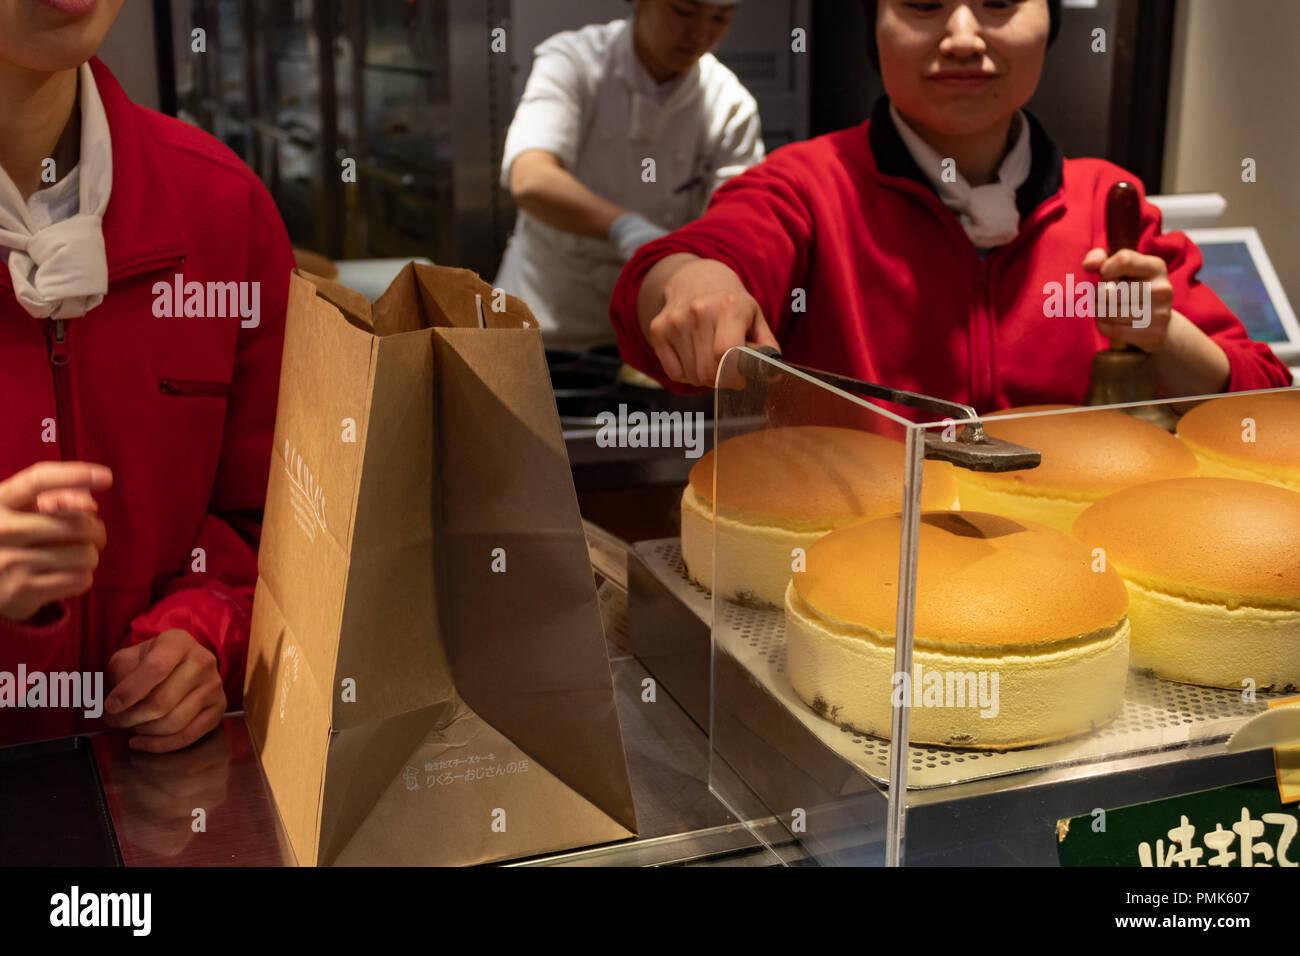 OSAKA, JAPAN - JAN 29, 2018: Woman marking with fire the famous japanese sponge cake in Rikuro Ojisan store - Stock Image